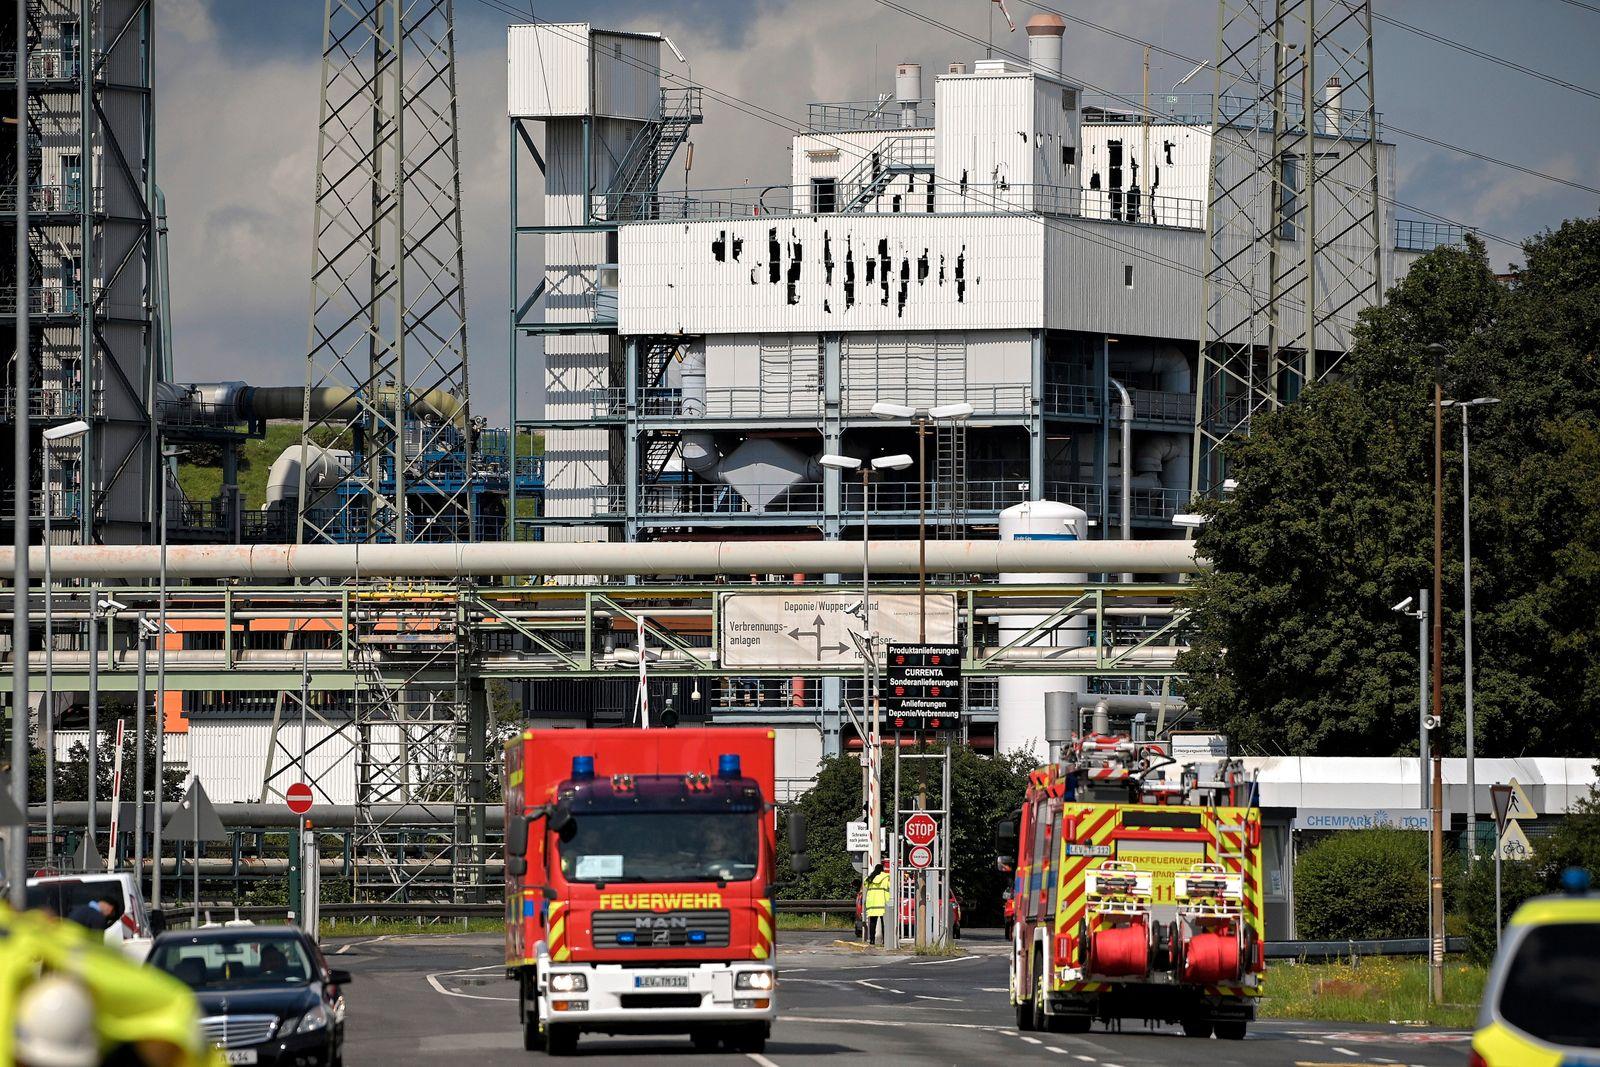 Explosion at Chempark in Leverkusen aftermath